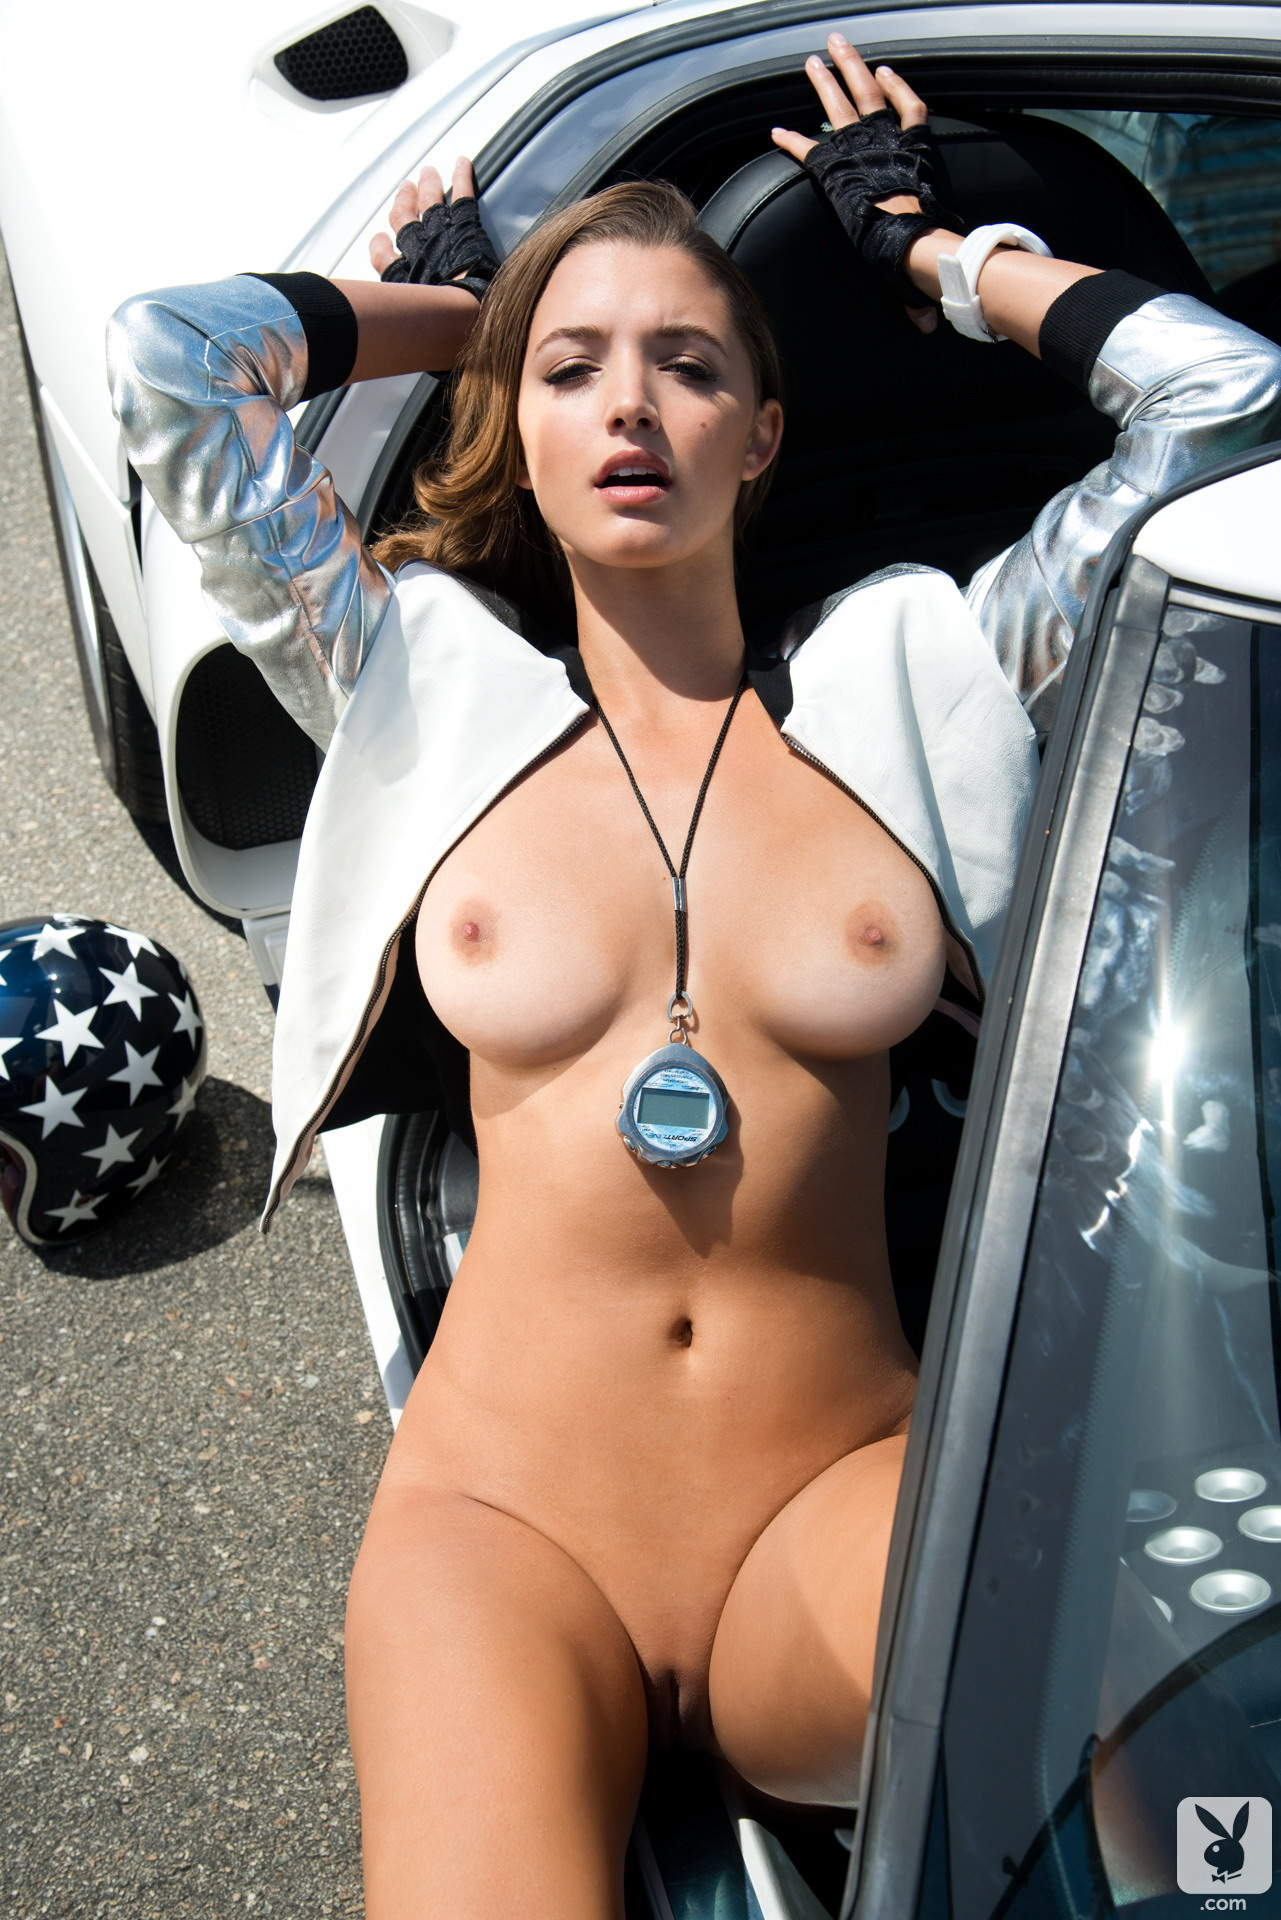 Hot blonde latina naked